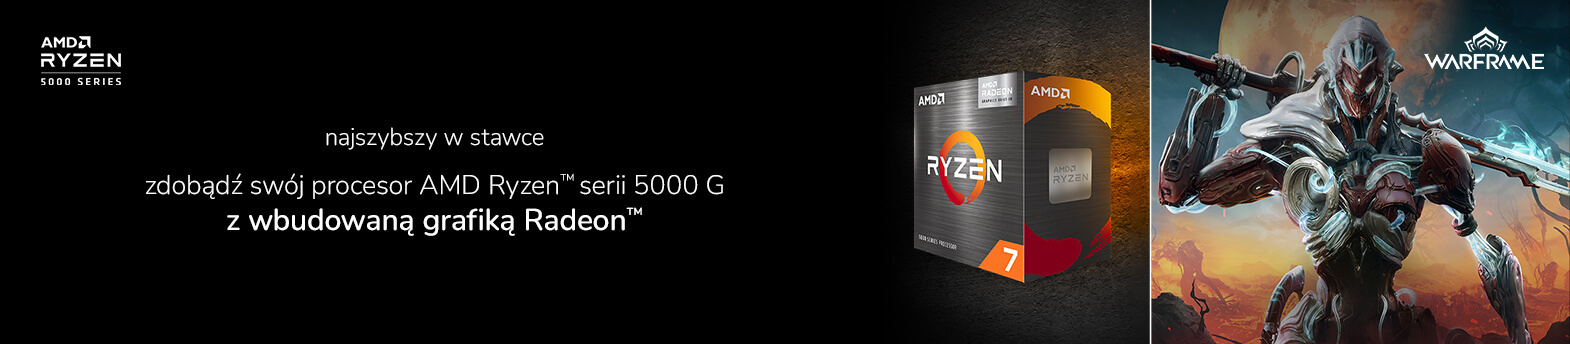 premiera AMD Ryzen 5000 G